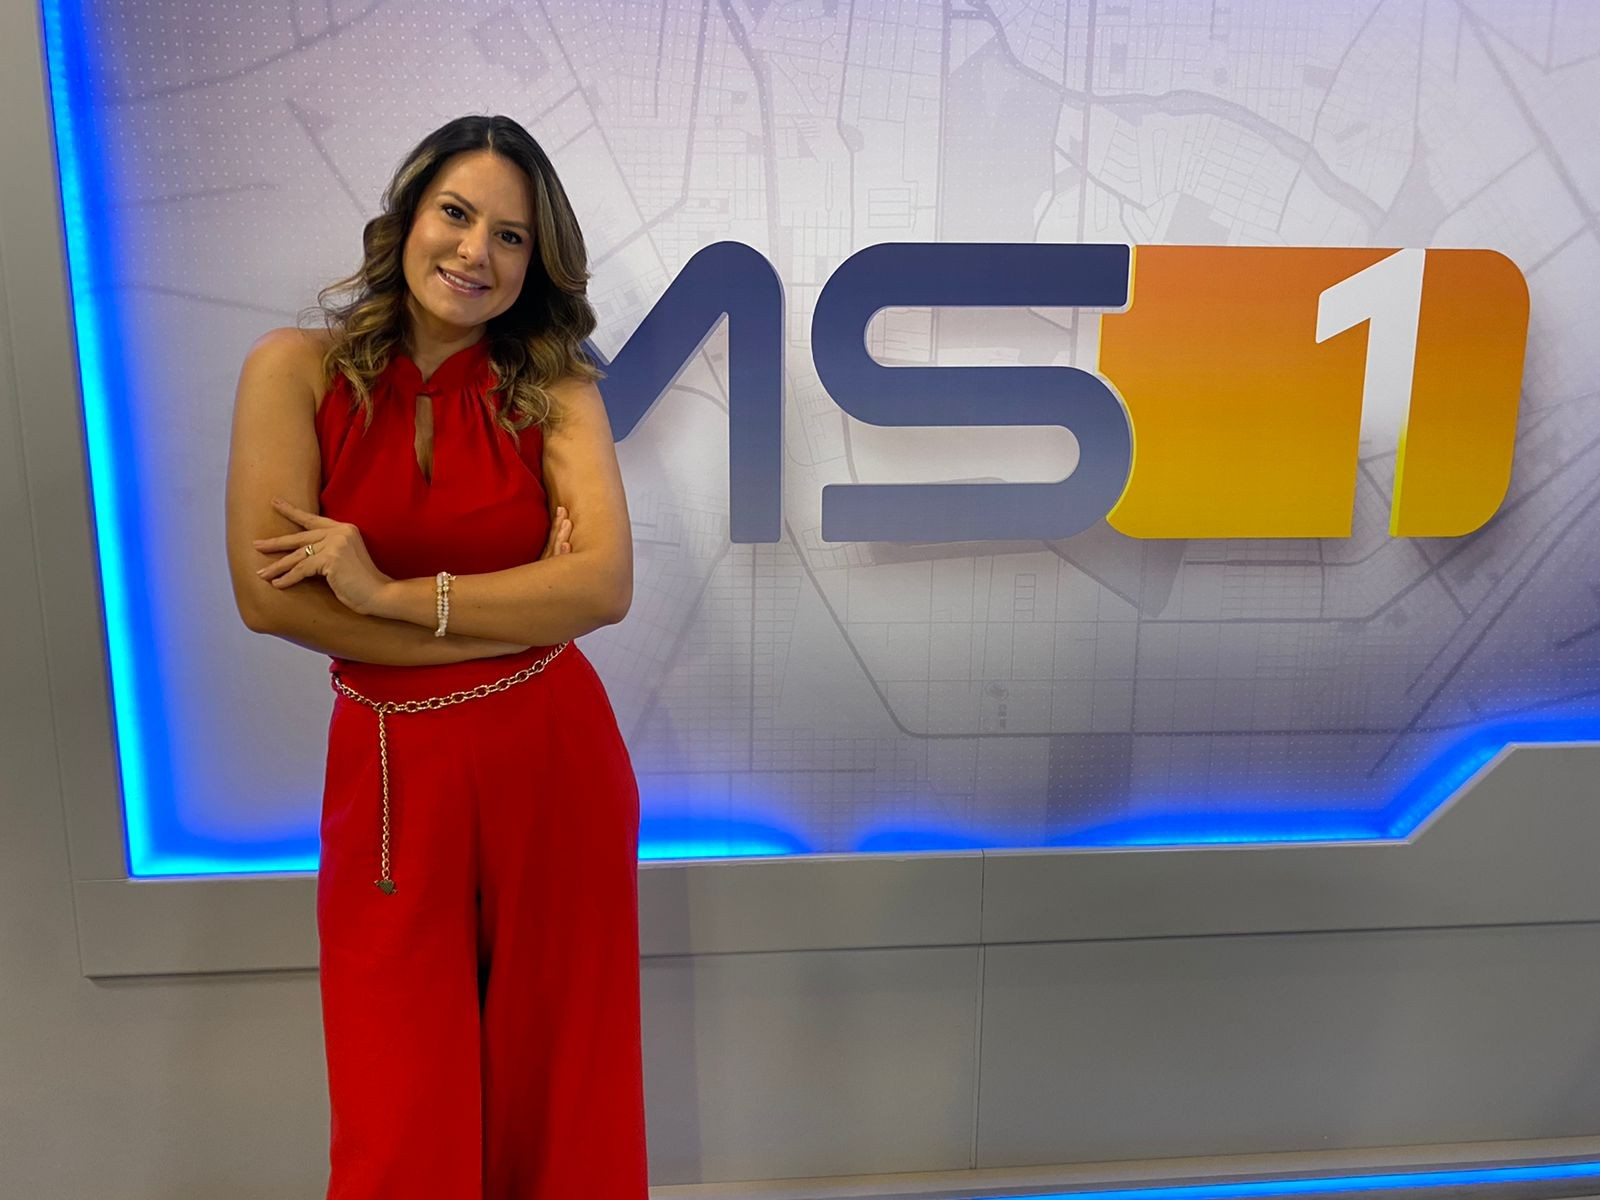 Assista ao MS1 ao vivo